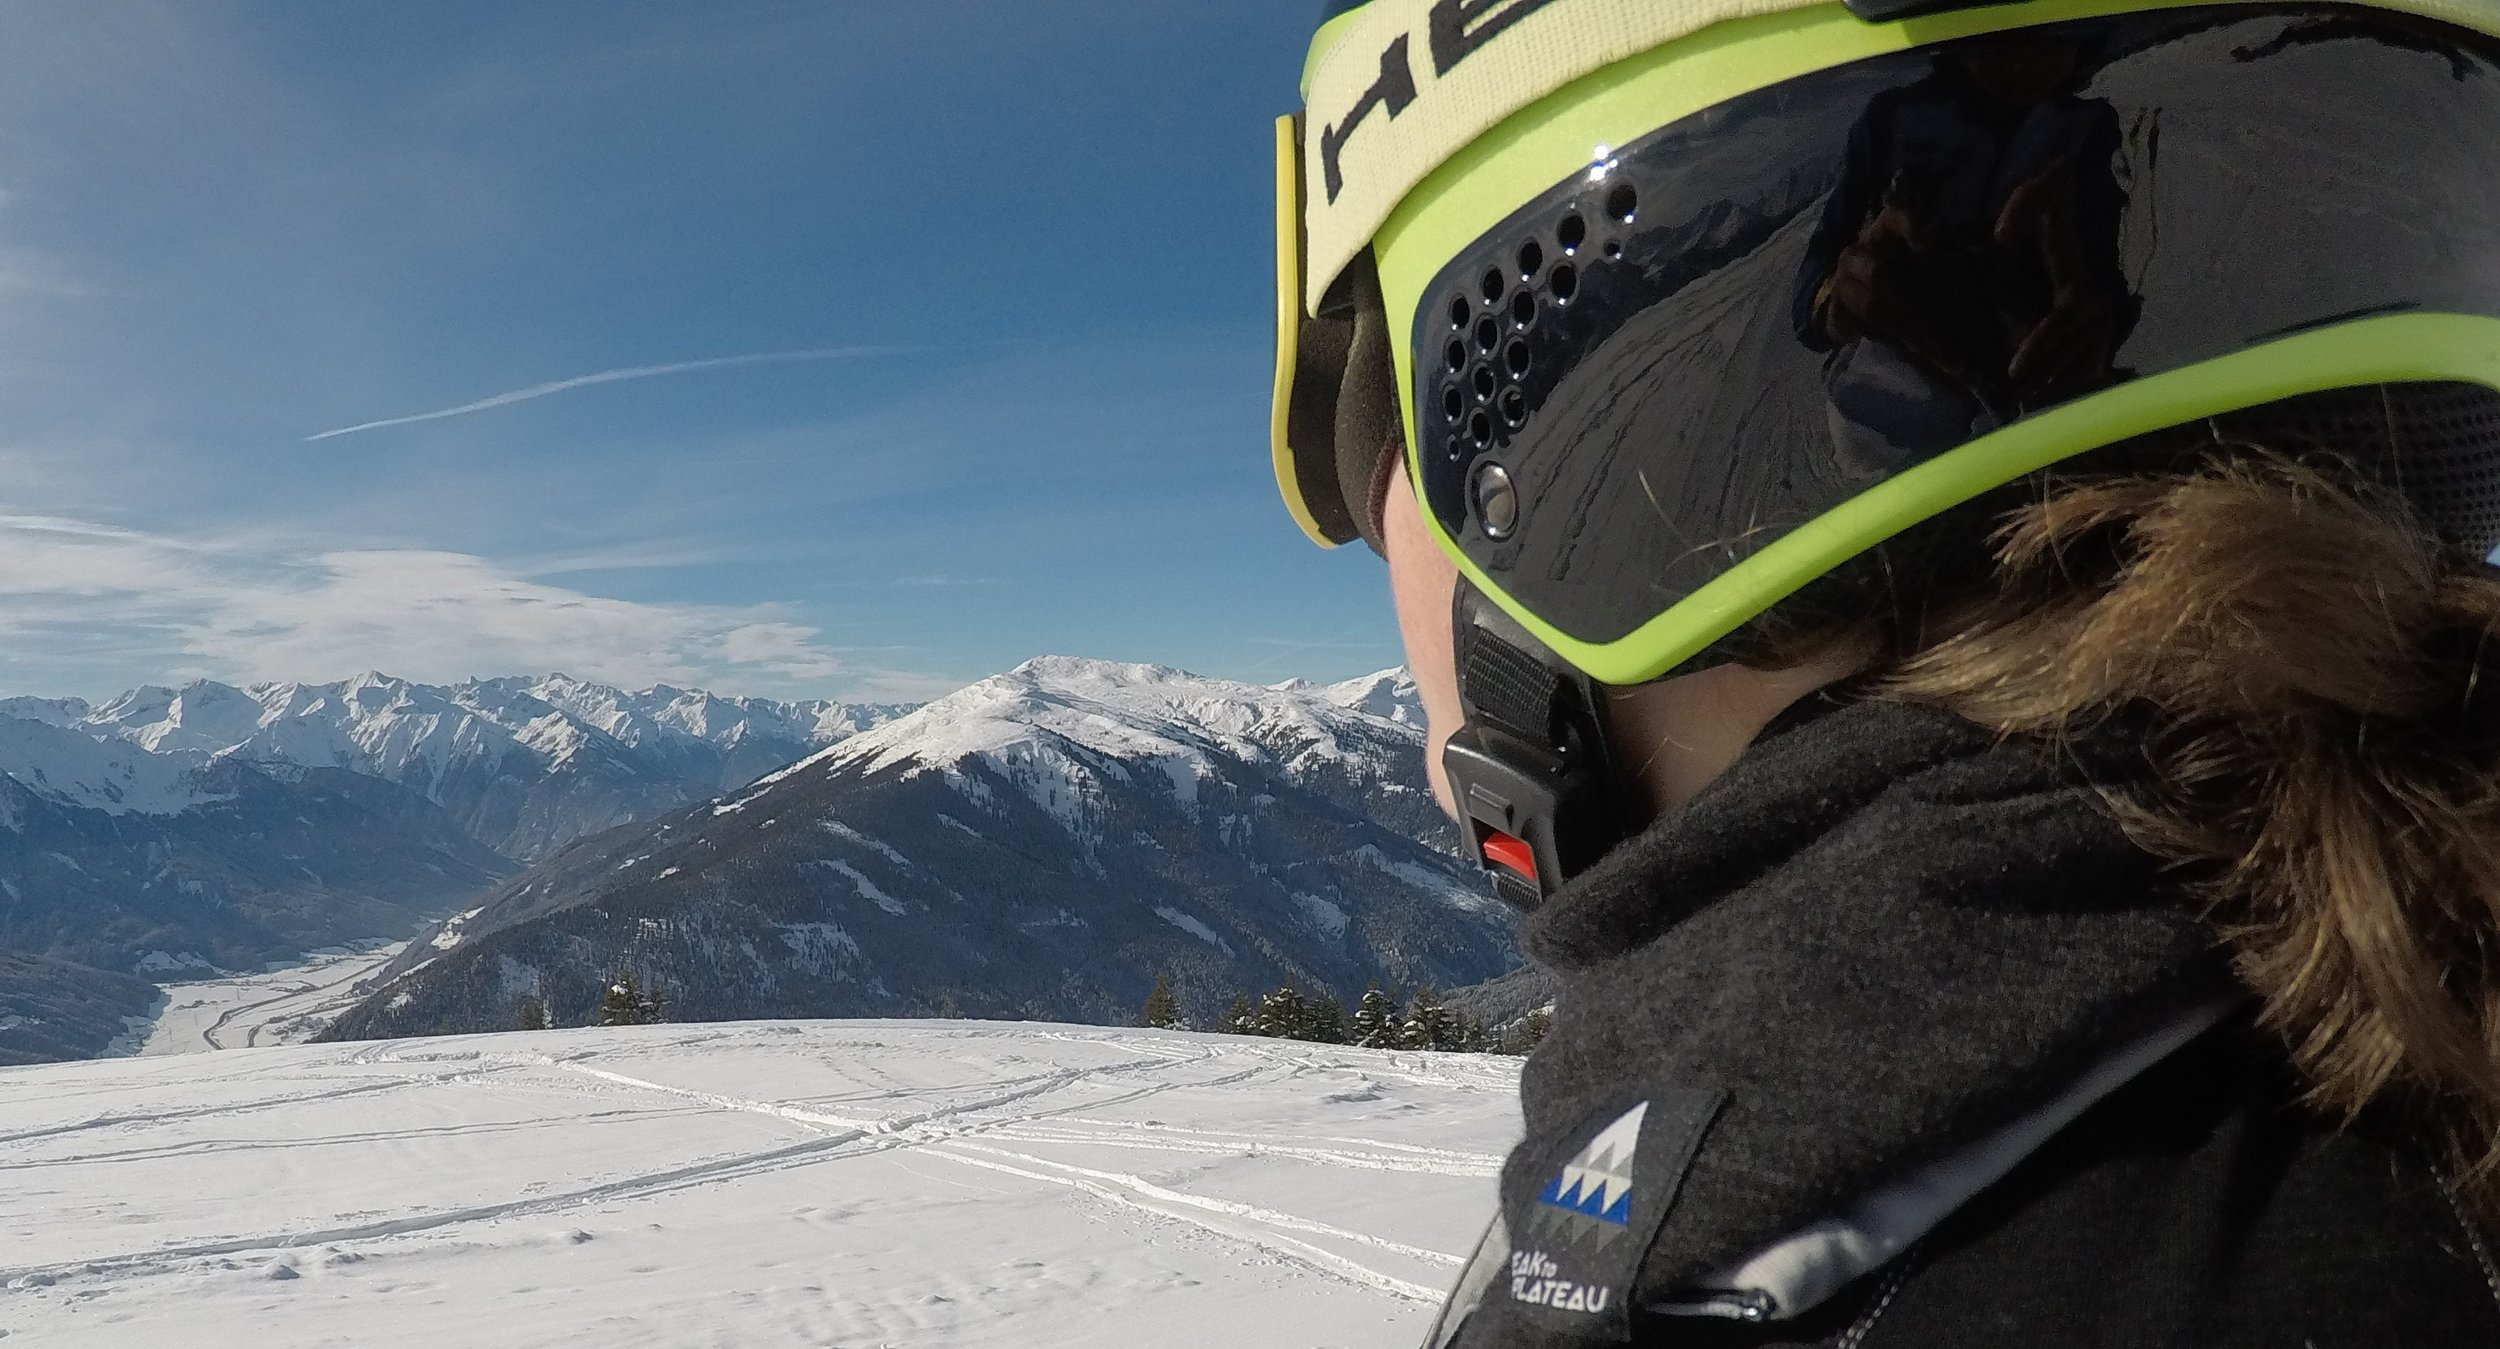 Top of Pass Thurn, Austria #peaktoplateau